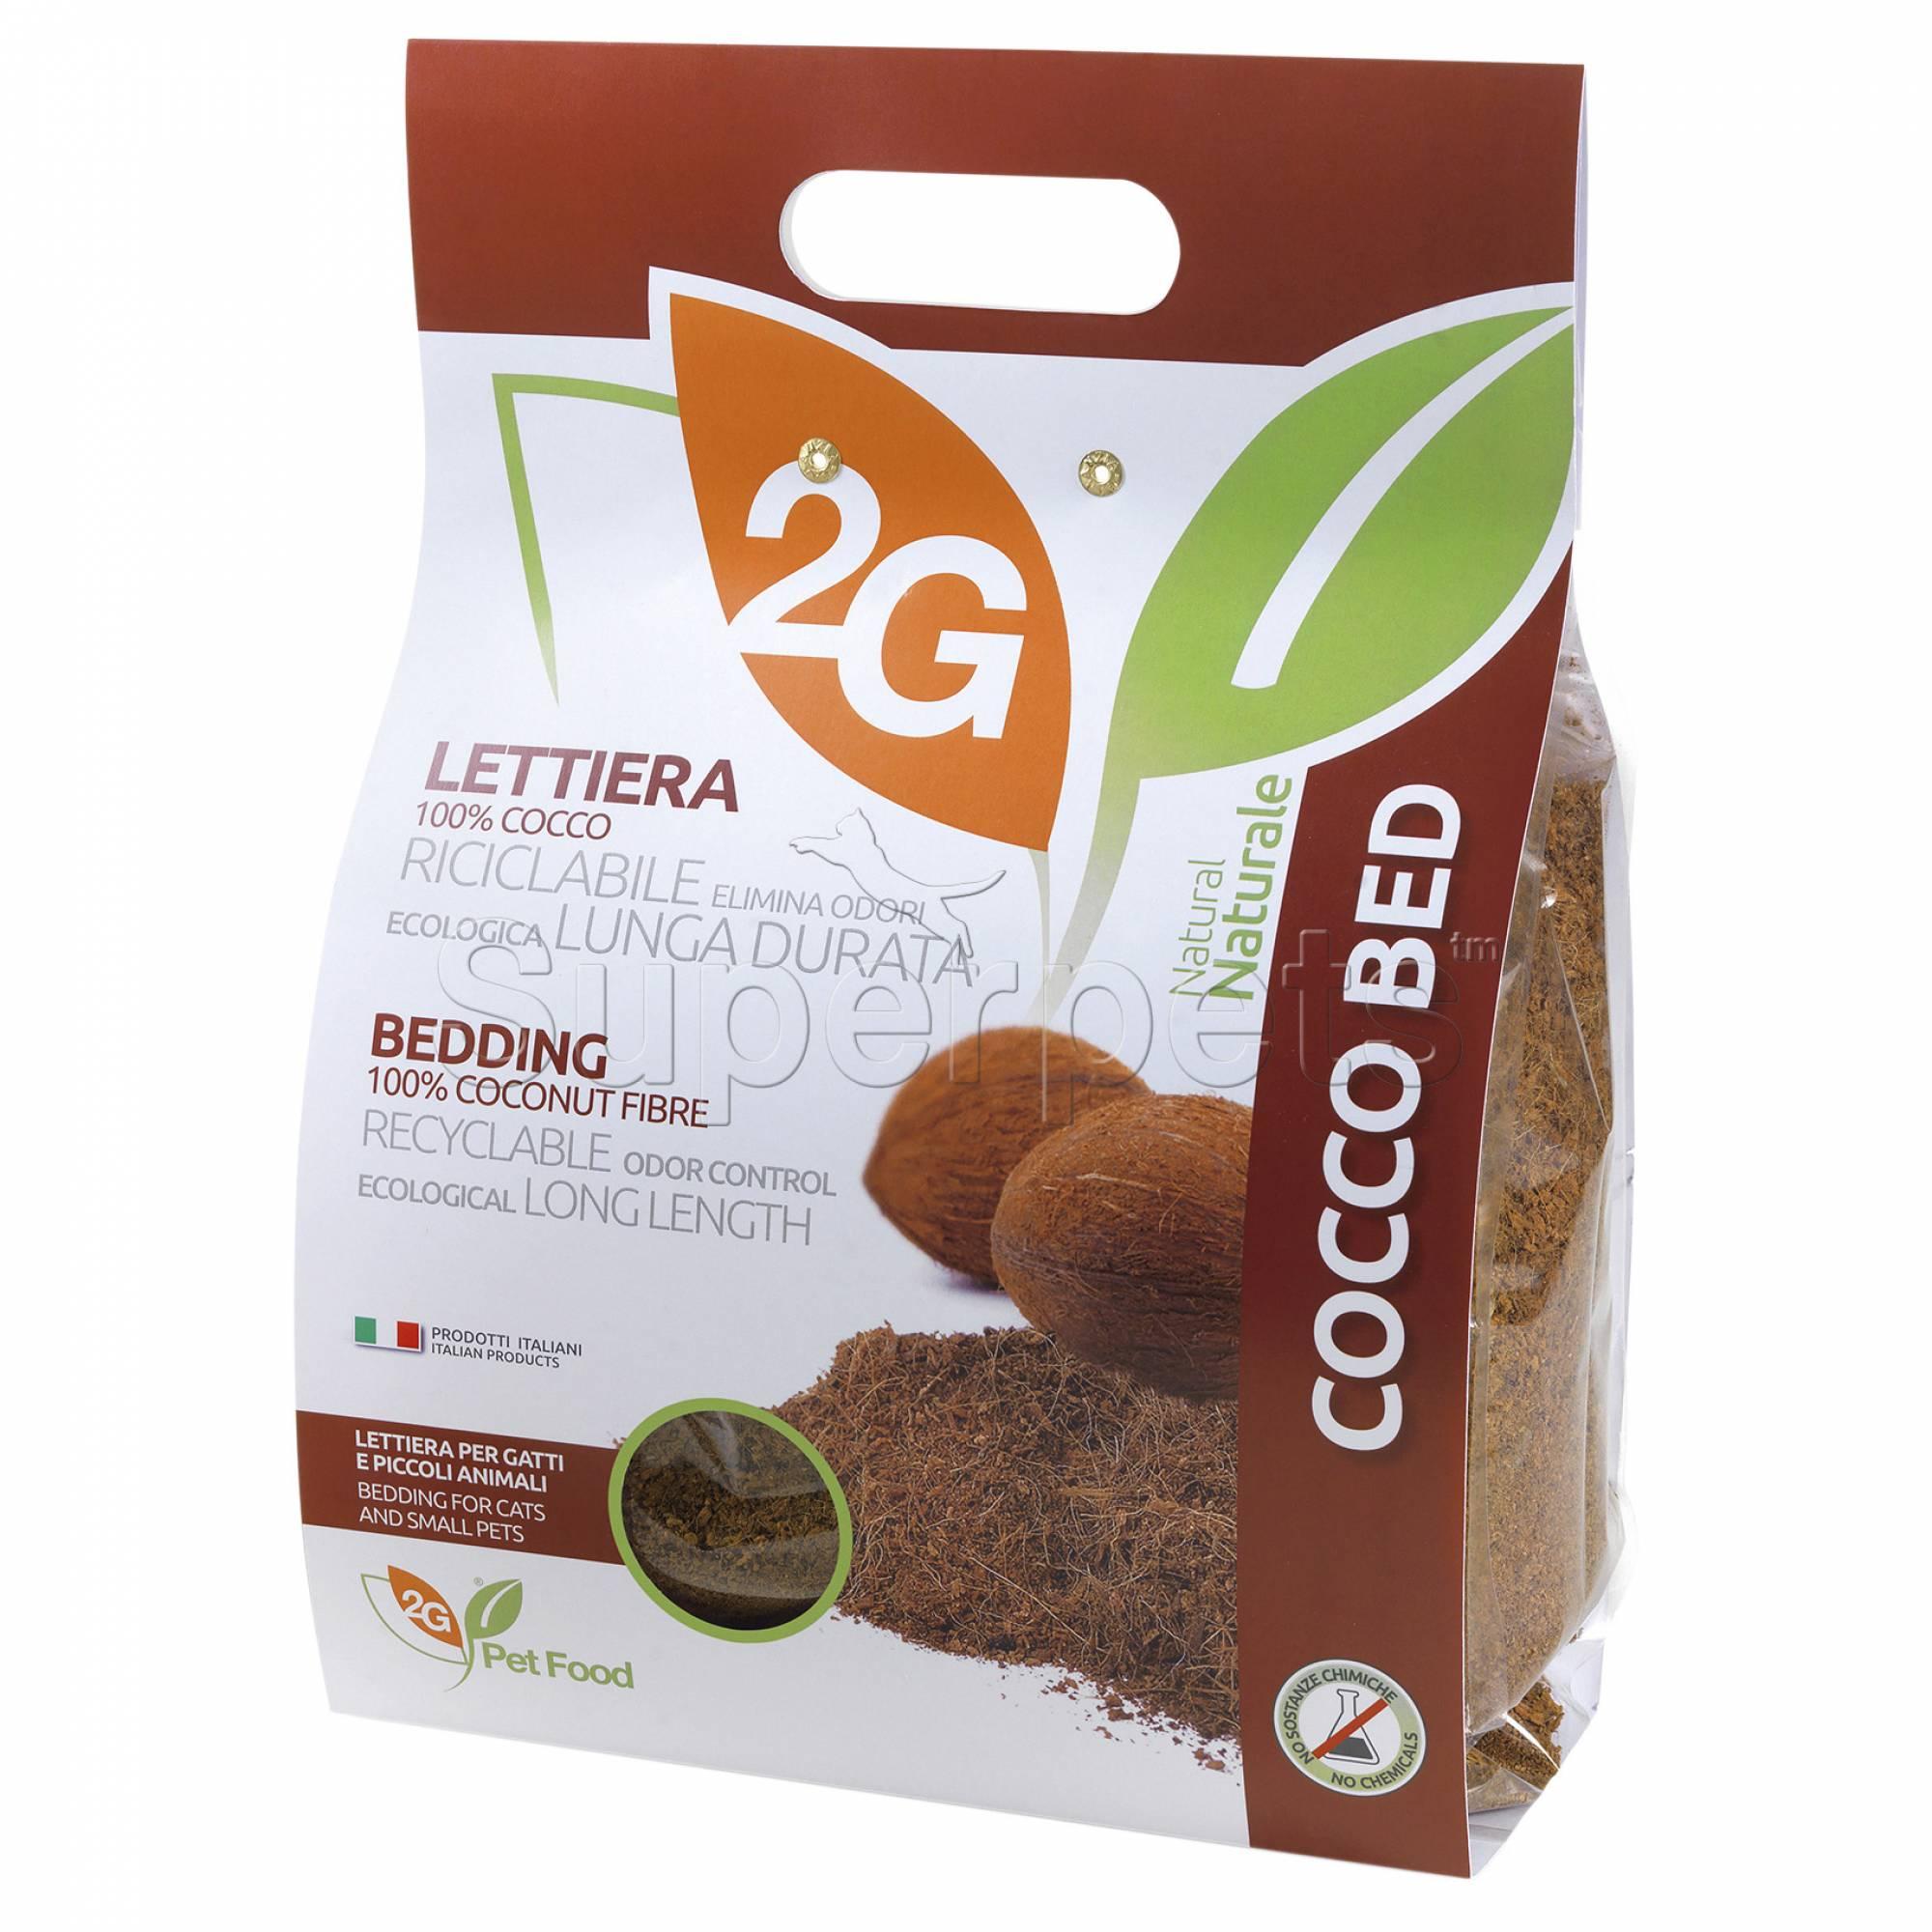 2G Pet Food - Cocco Bed 5L